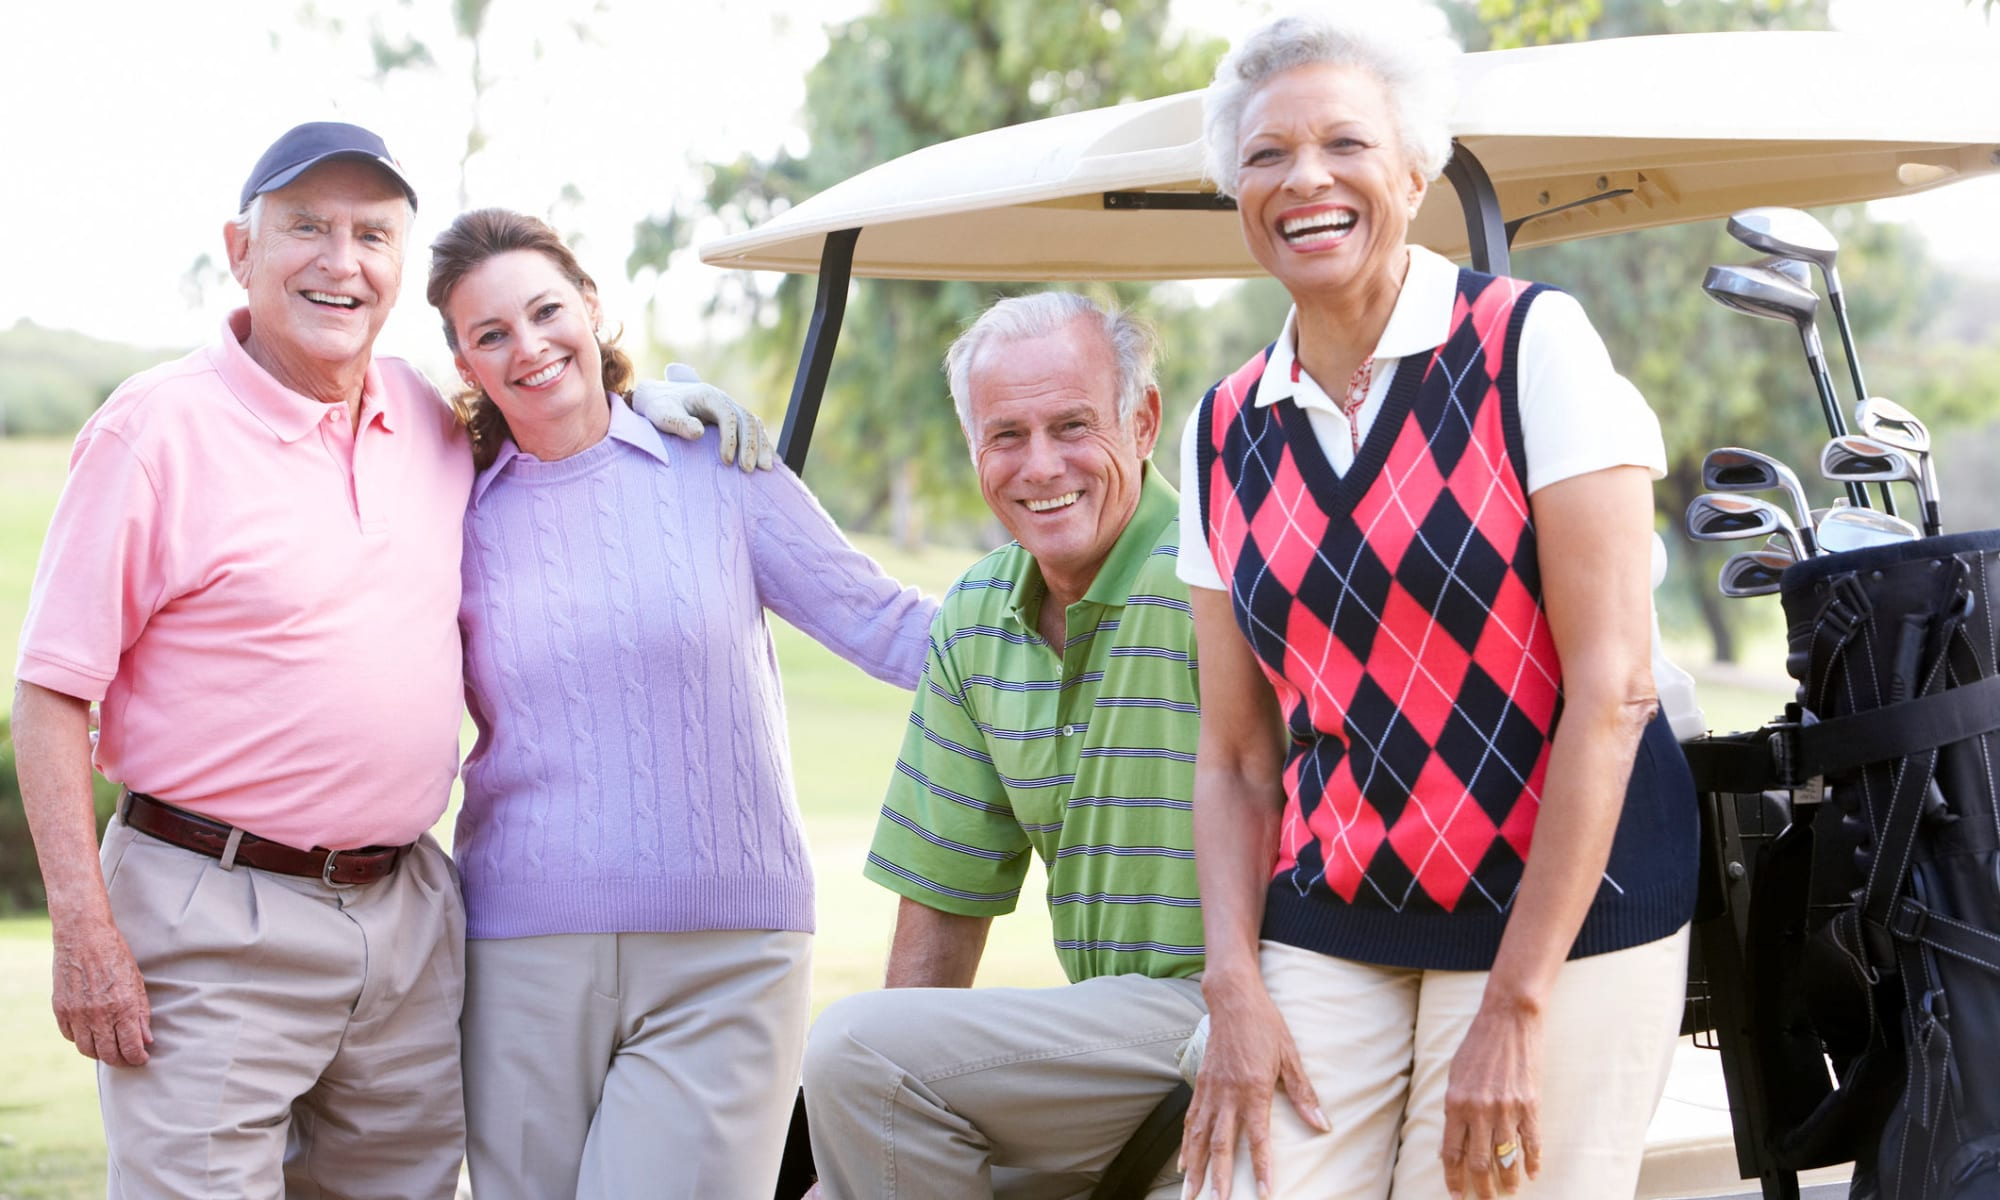 Residents golfing nearby Broadwell Senior Living in Kearney, Nebraska